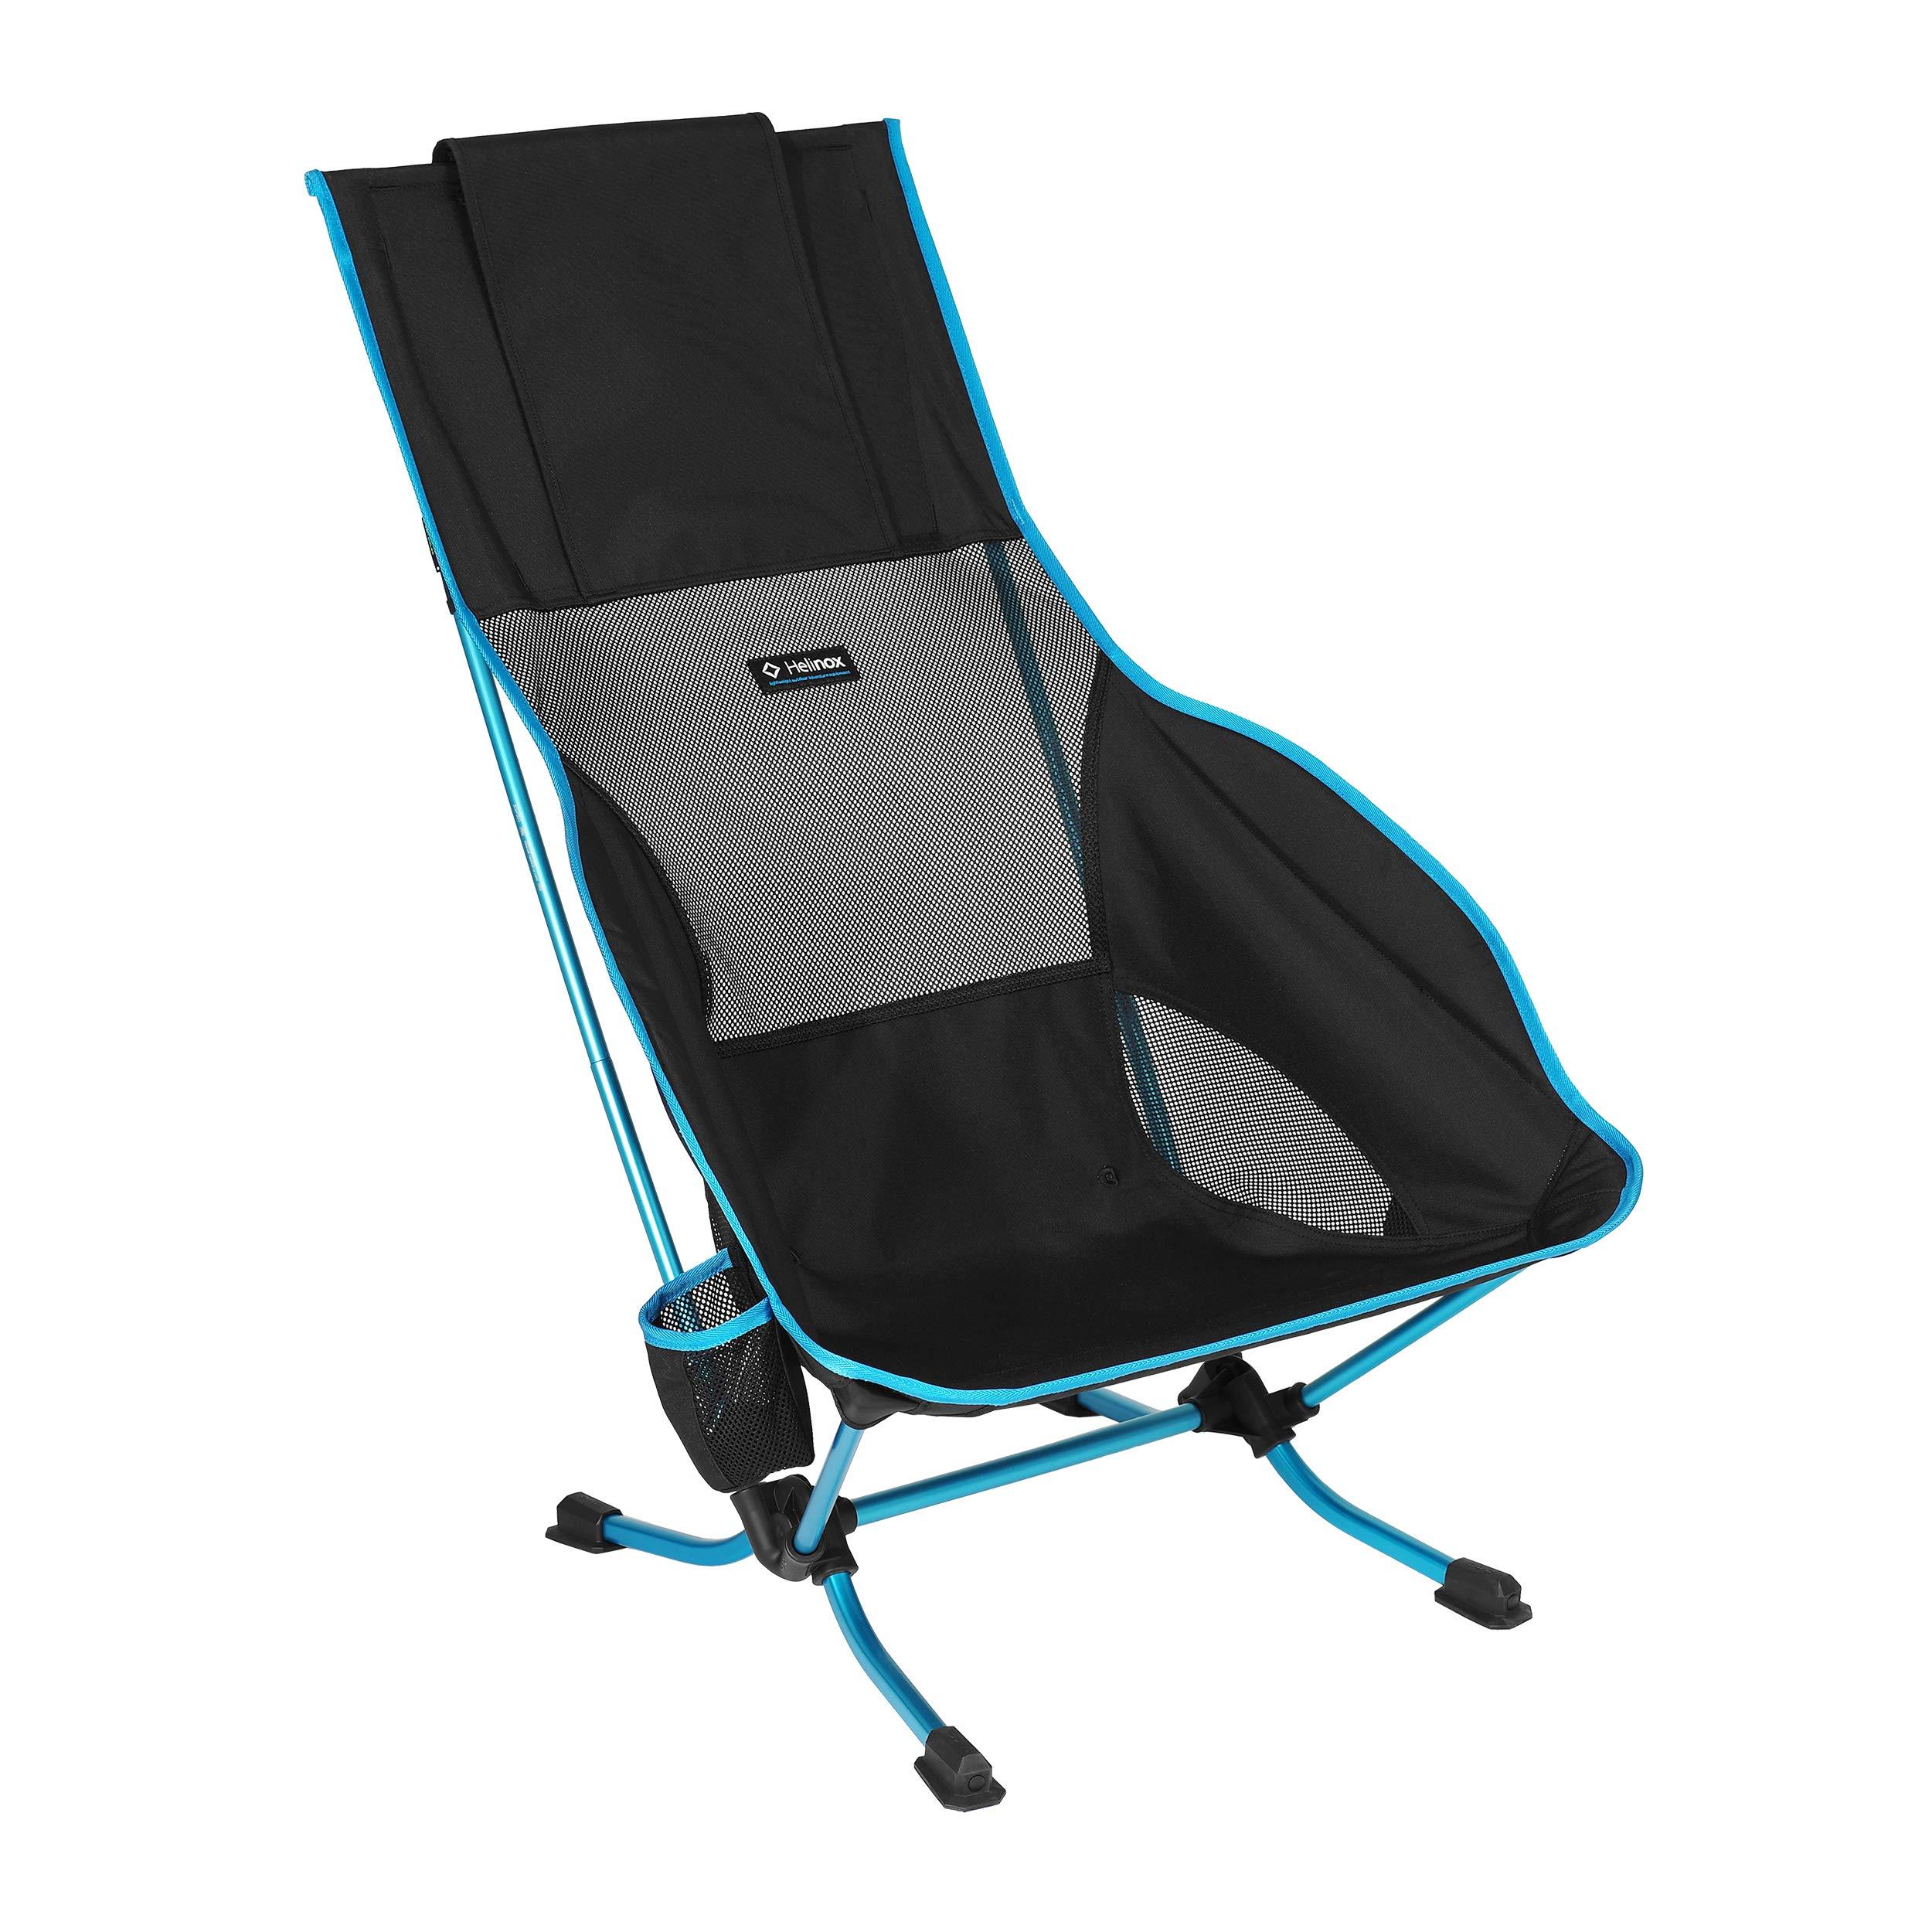 Helinox Playa Lightweight High-Back Collapsible Beach Chair, Black